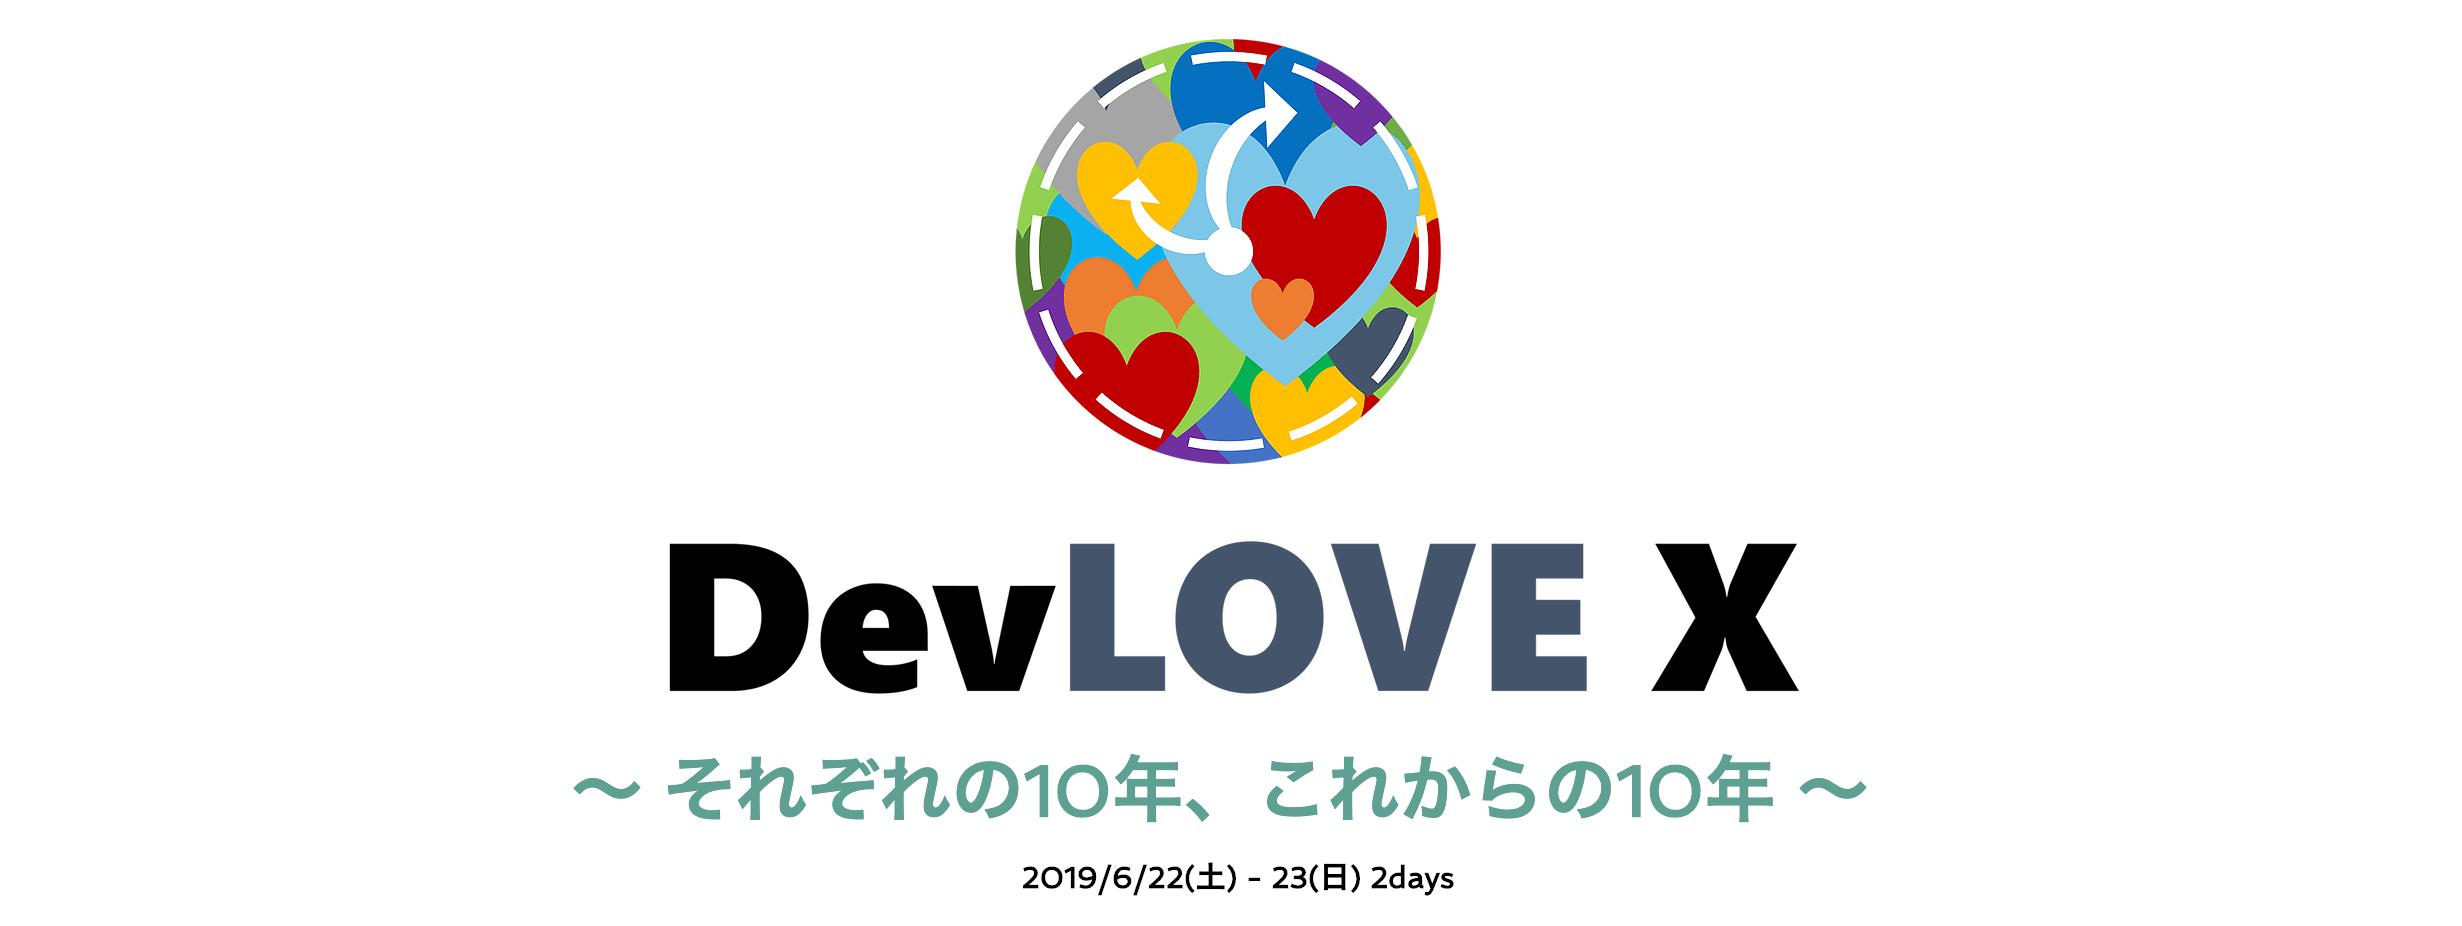 DEVLOVE X